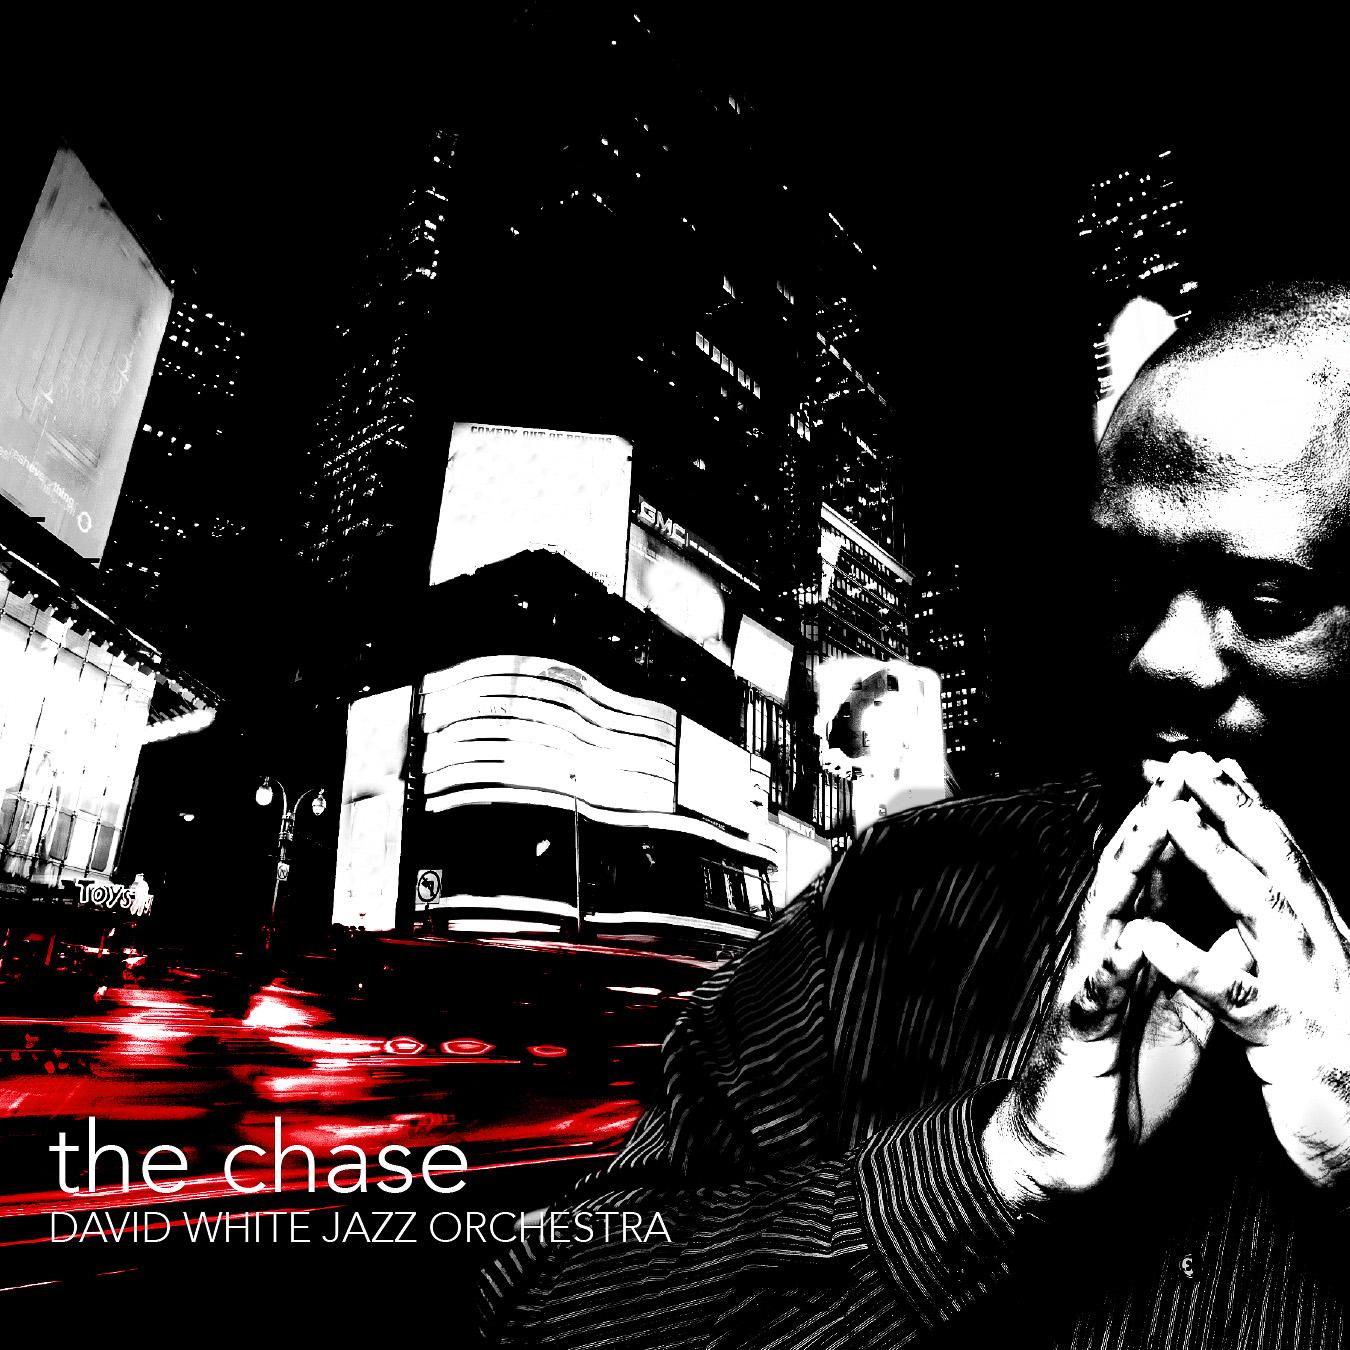 album cover-the-chase-david-white-jazz-orchestra.JPG